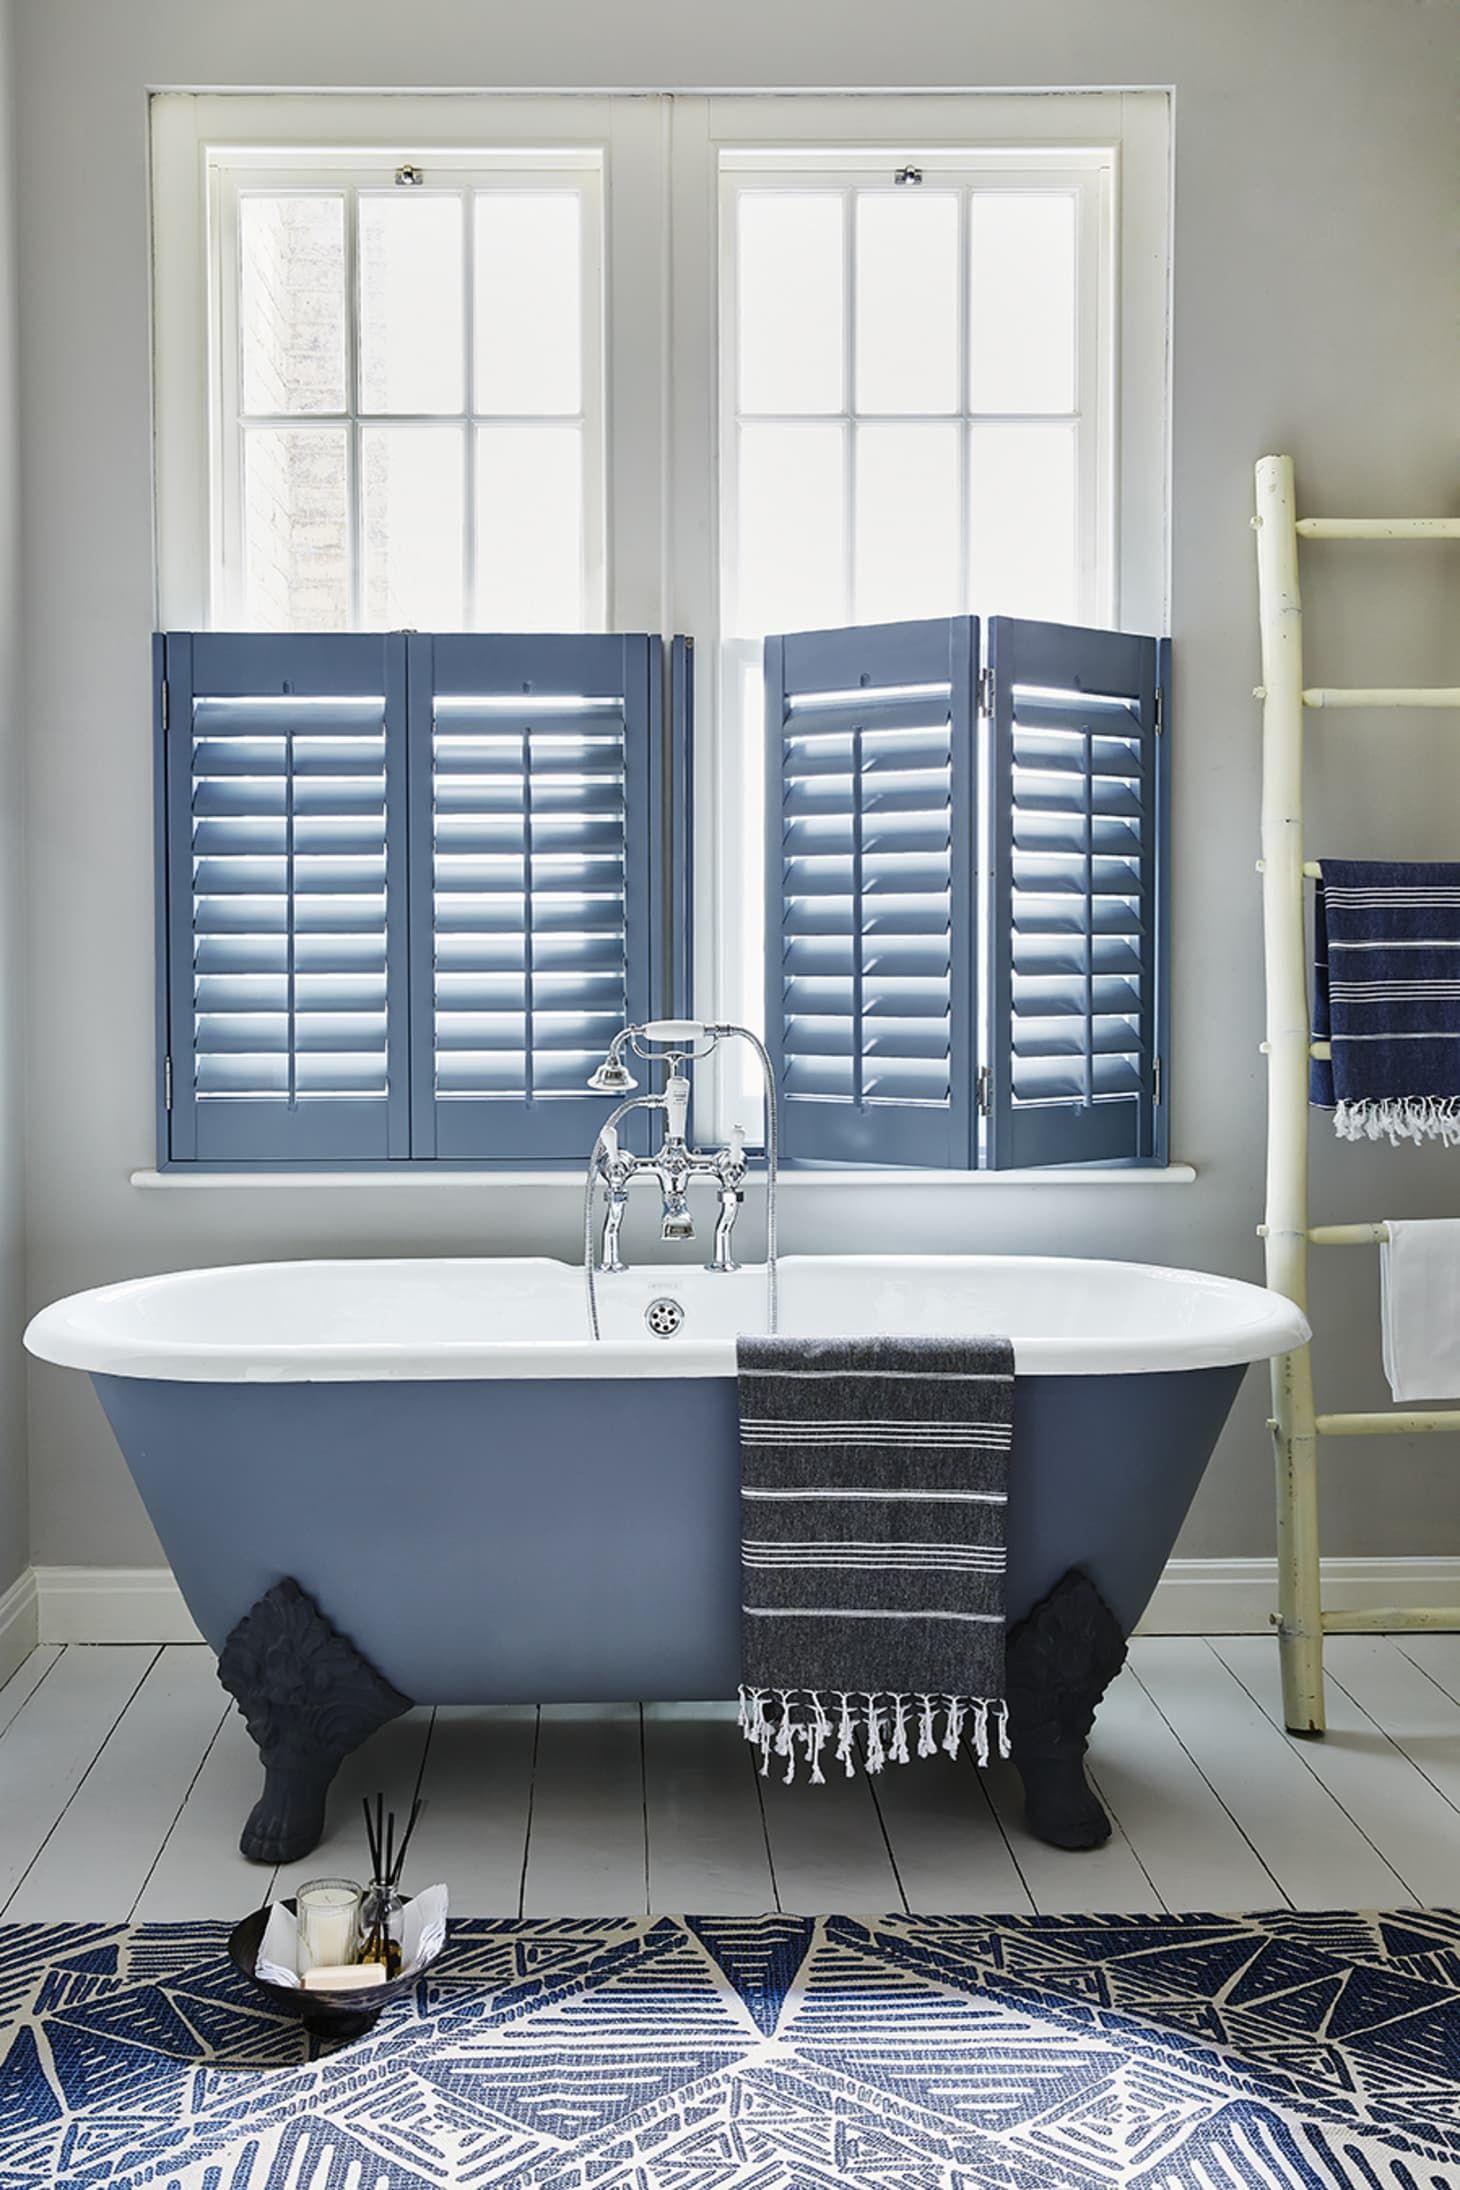 8 Solutions For Bathroom Windows Bathroom Windows Traditional Bathroom Interior Windows